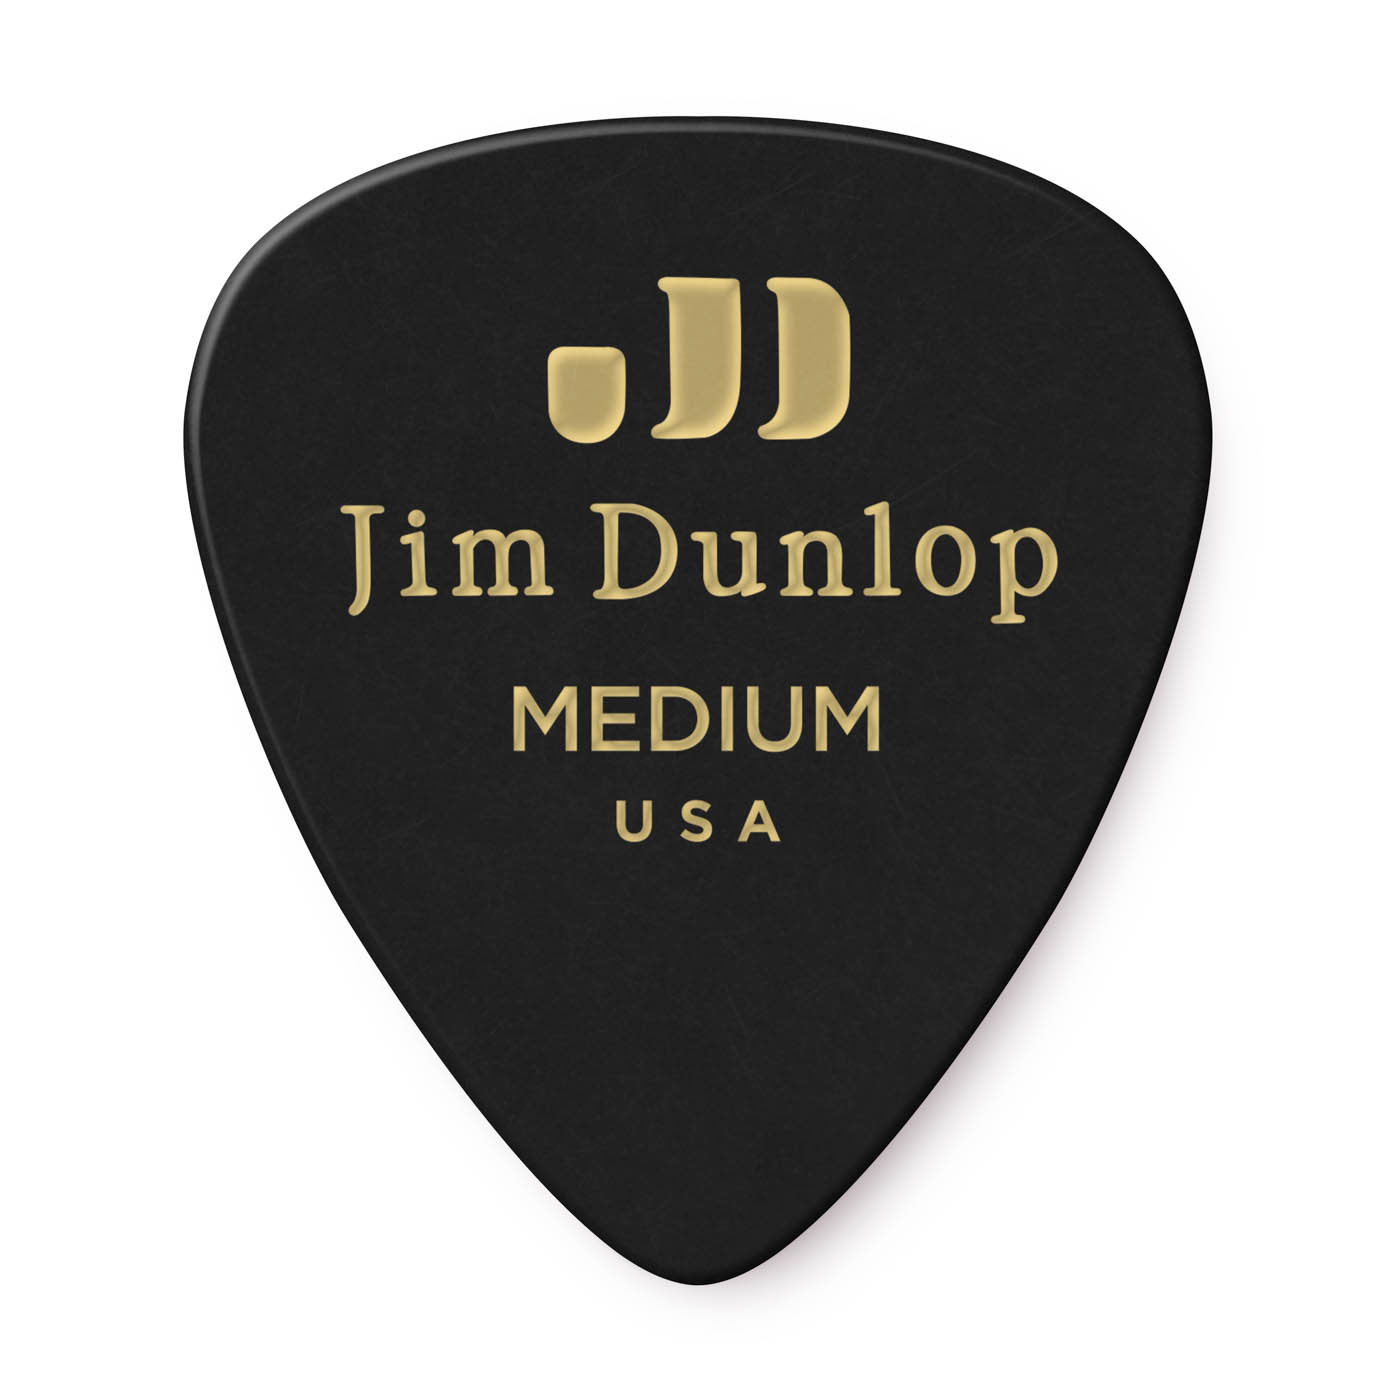 Dunlop - Black Classic medium